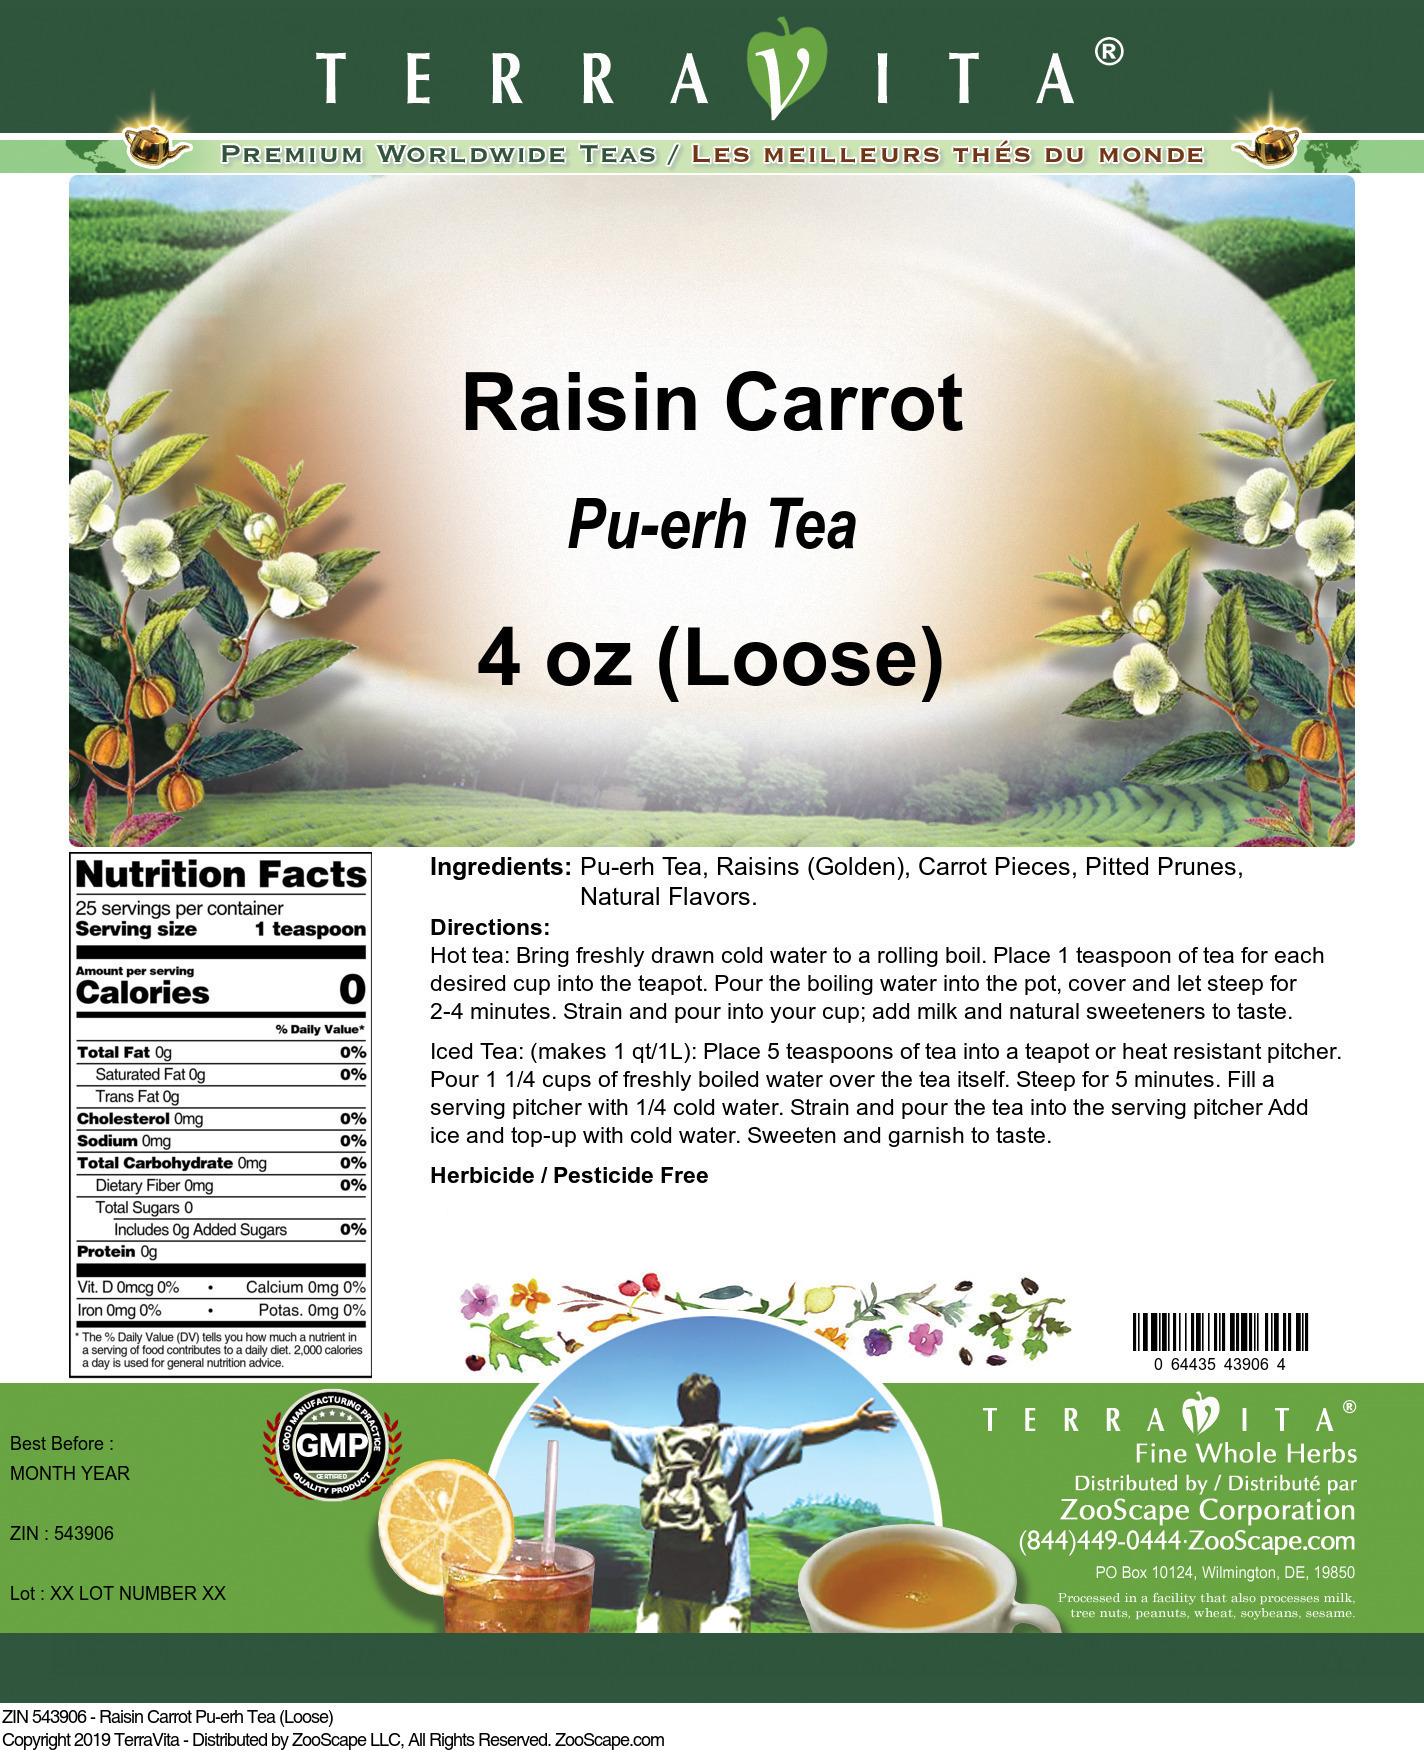 Raisin Carrot Pu-erh Tea